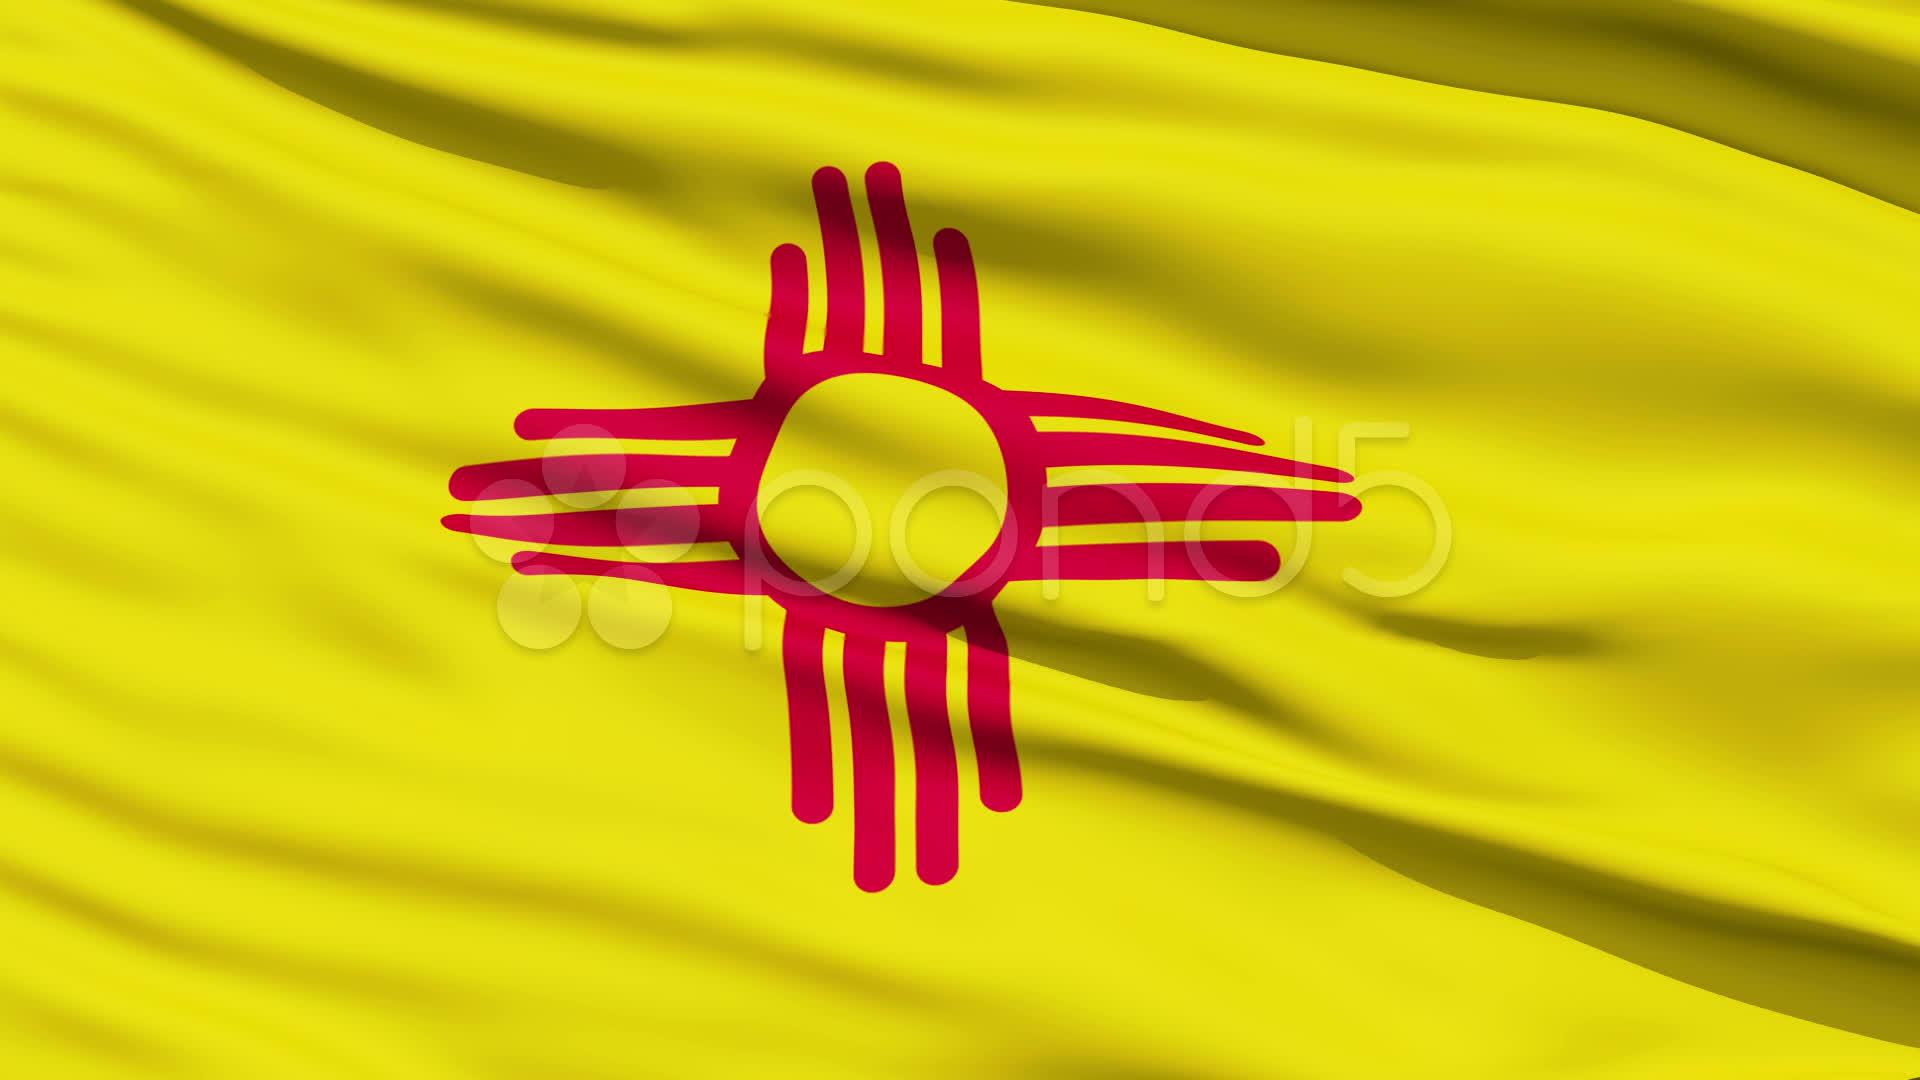 New Mexico Flag Wallpaper Wallpapersafari